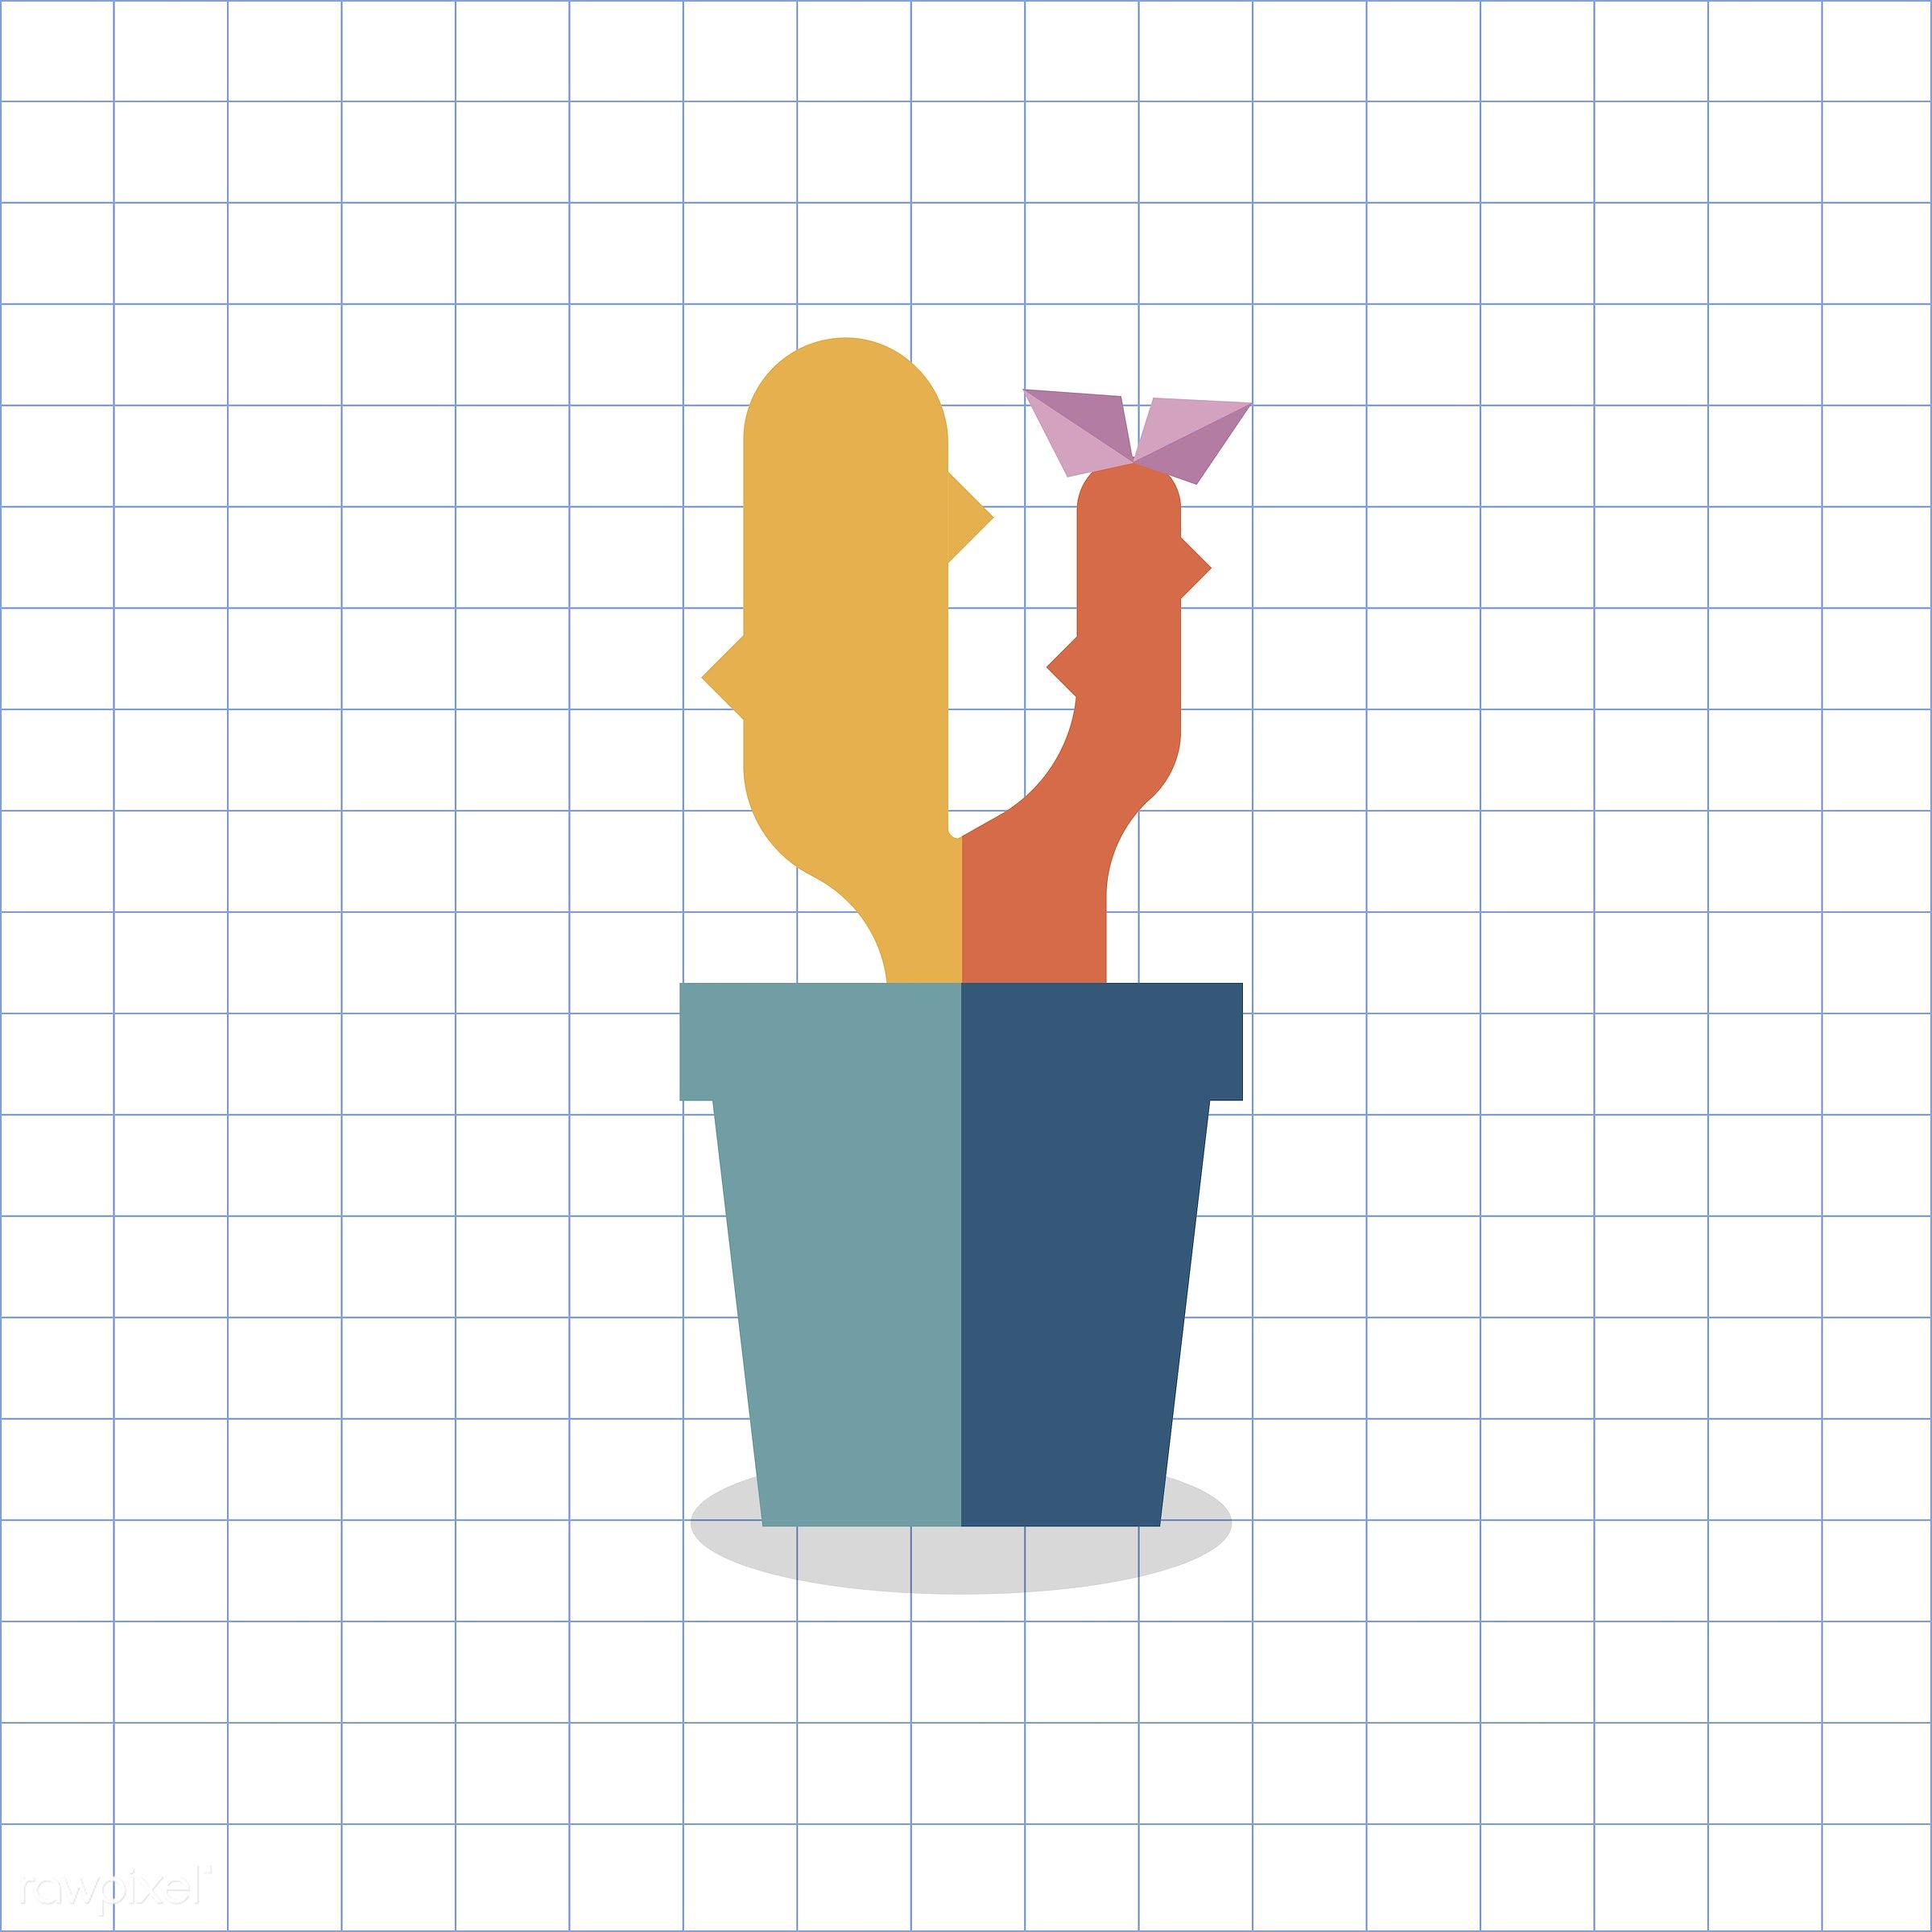 vector, graphic, illustration, icon, symbol, colorful, cute, plant, tree, nature, cactus, cacti, planted, pot, blue, orange